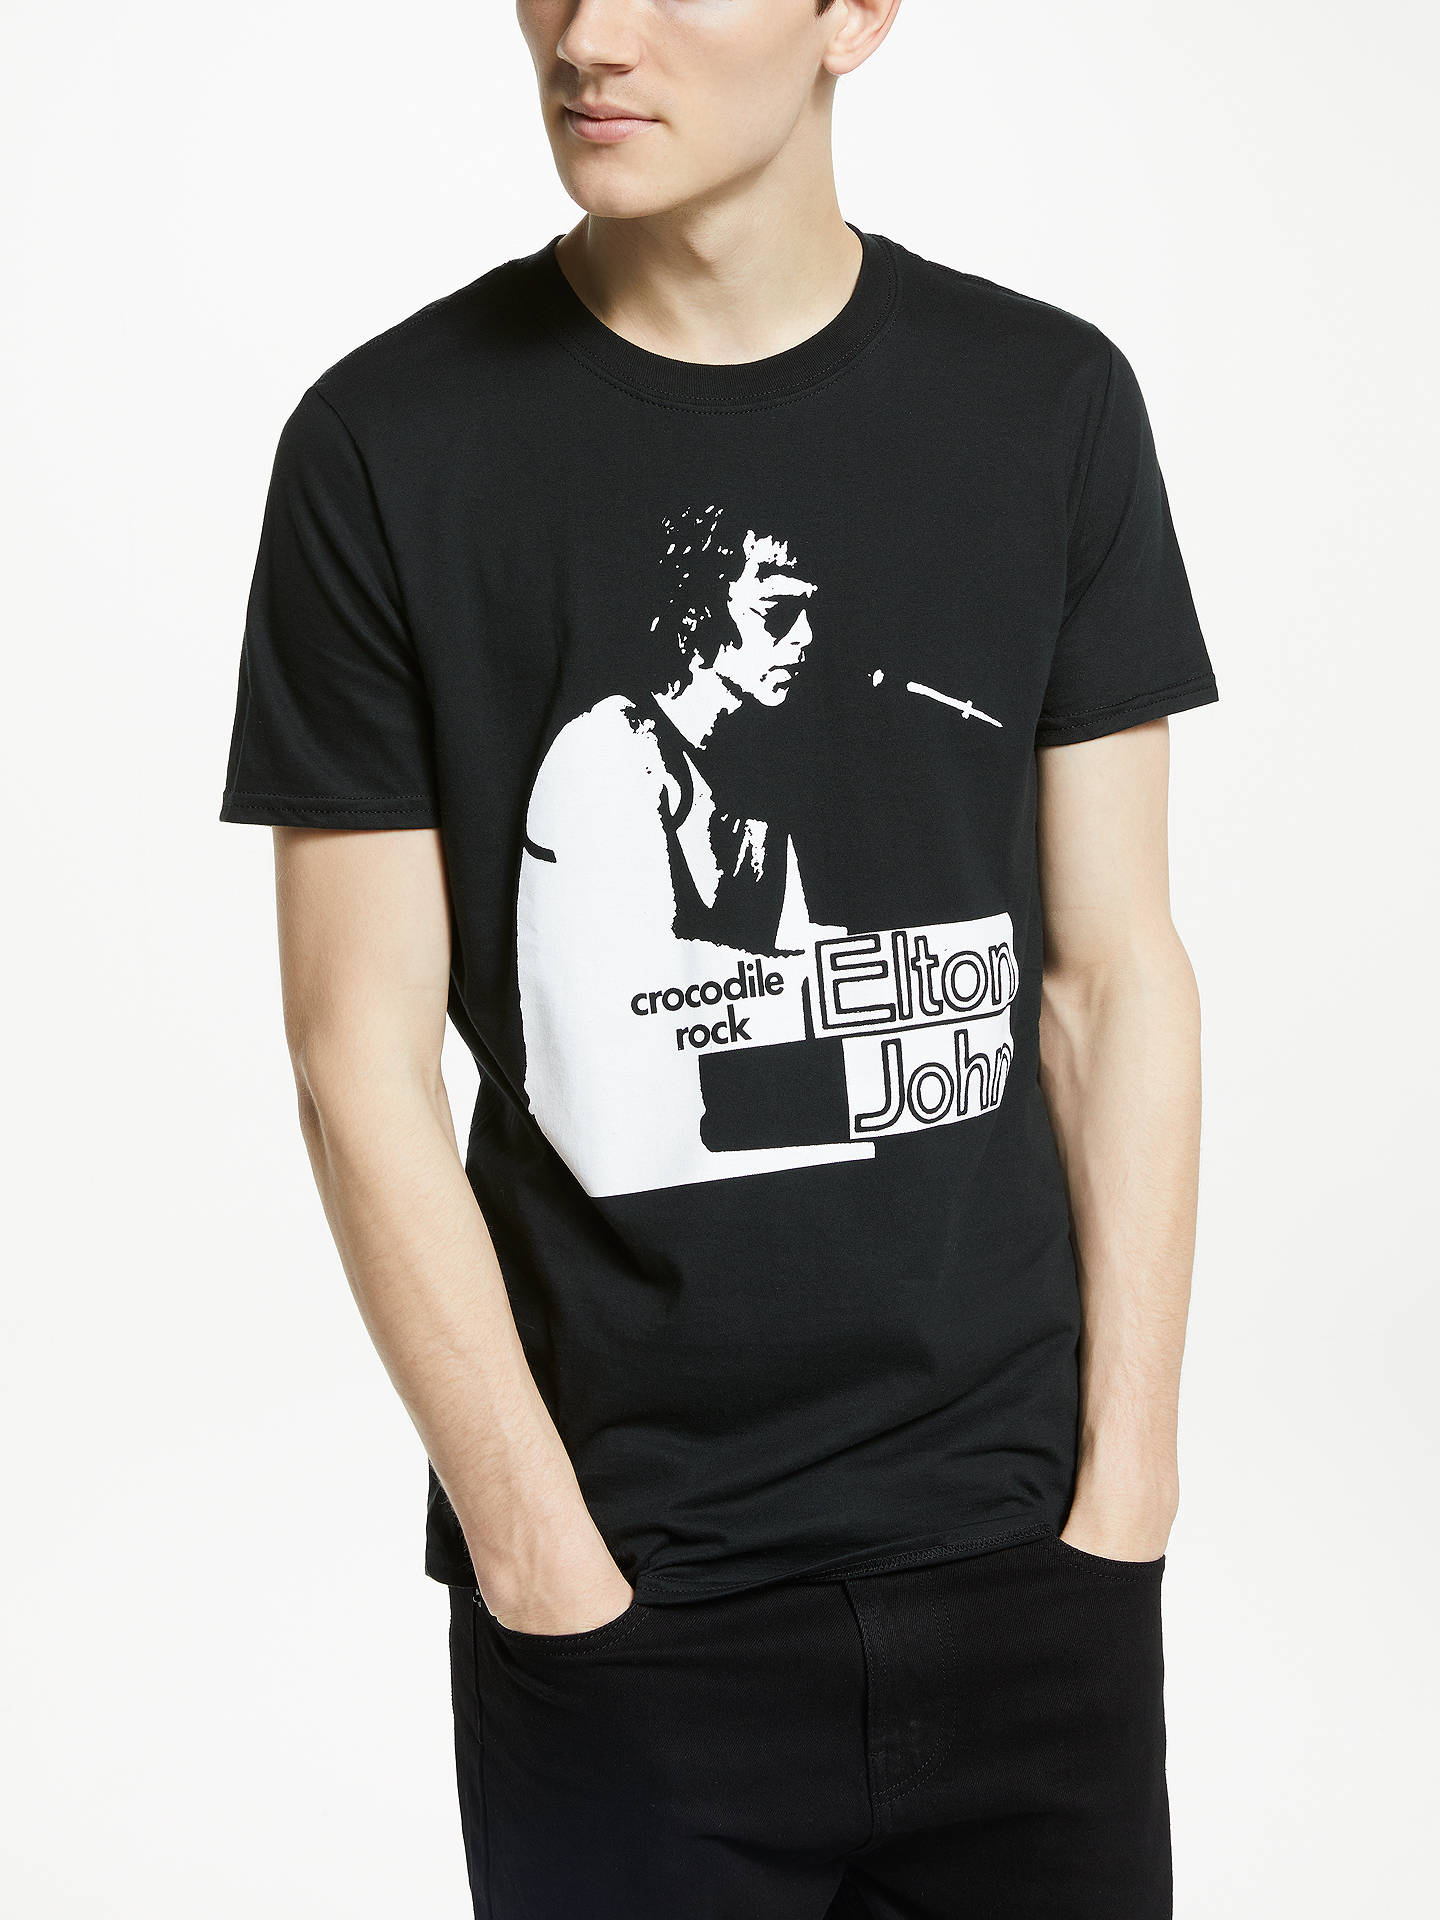 bf1147cca4f8 Buy Elton John Crocodile Rock Graphic T-Shirt, Black, XL Online at  johnlewis ...